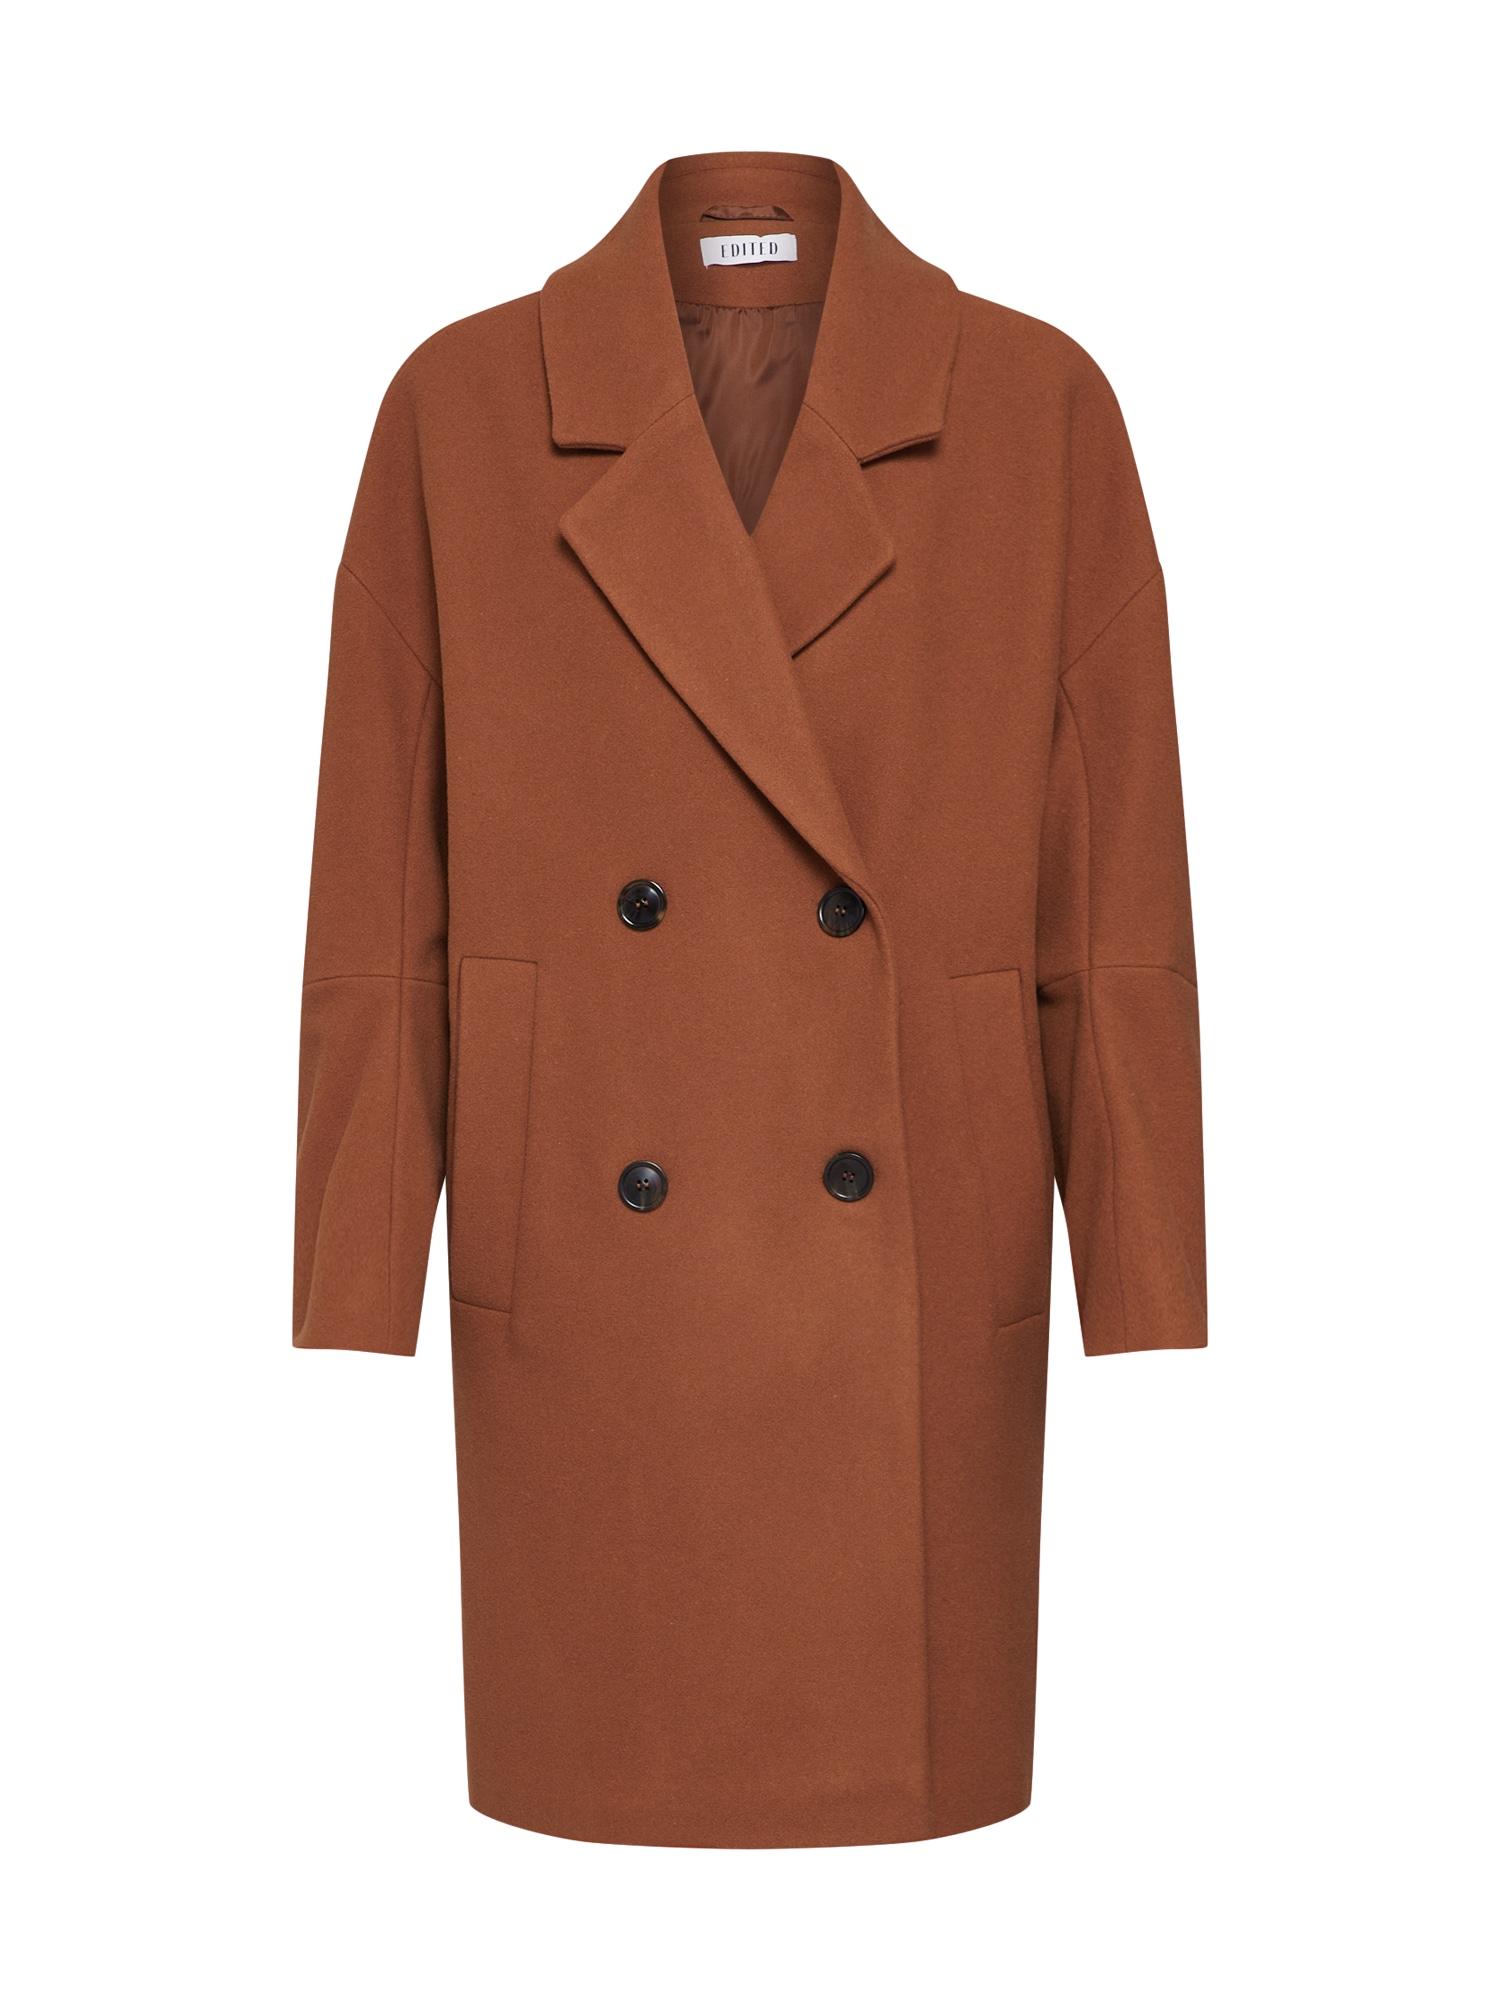 EDITED Rudeninis-žieminis paltas 'Hanne' ruda